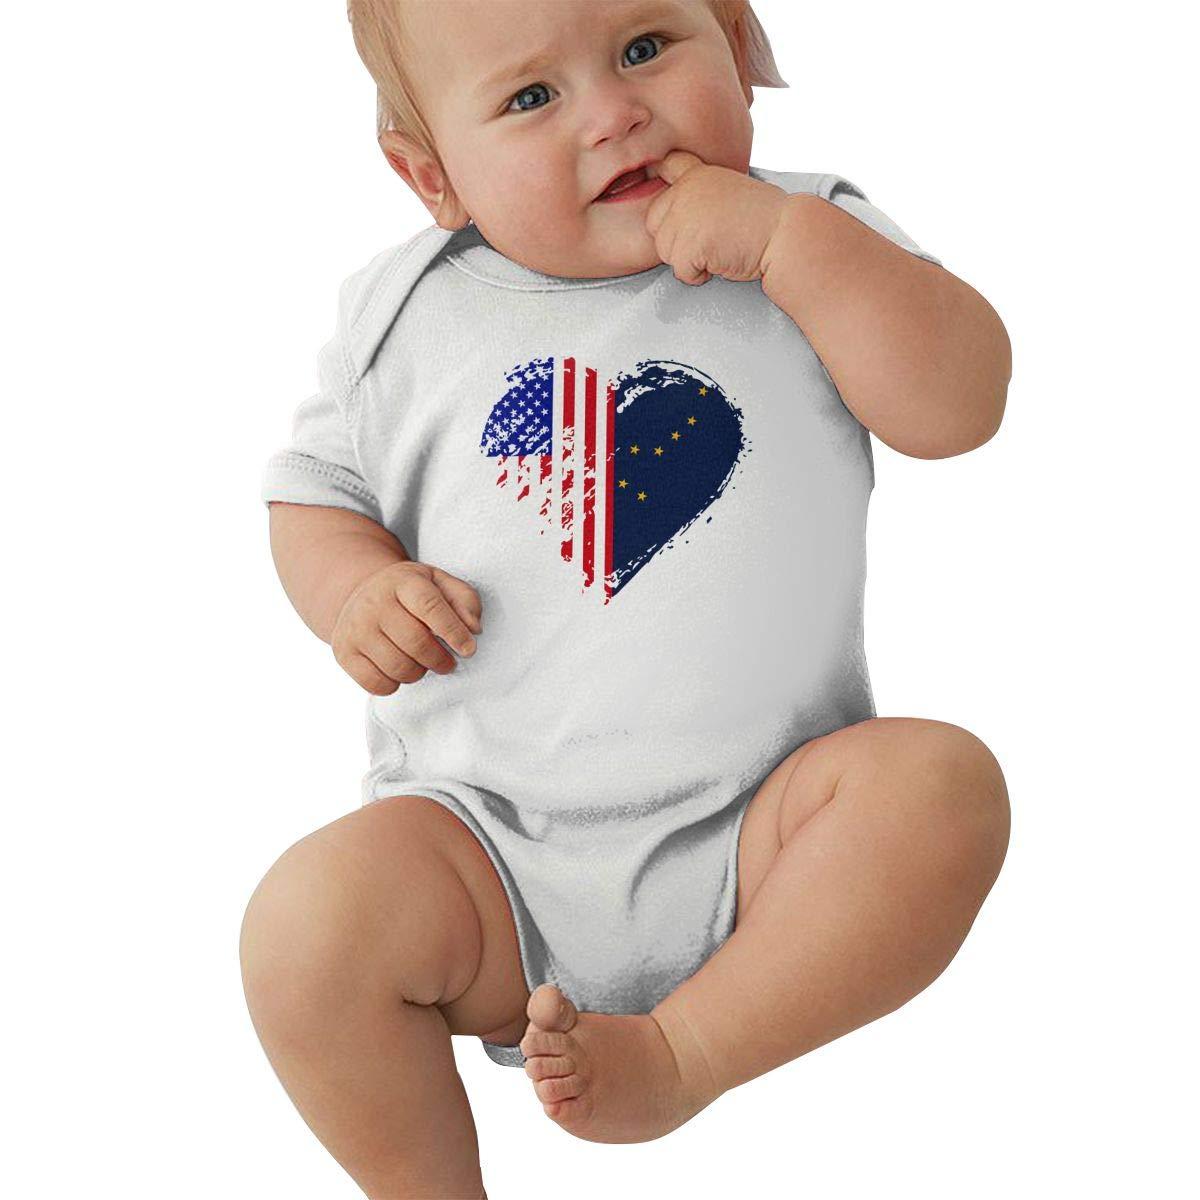 Mri-le2 Baby Boy Girl Short Sleeve Jersey Bodysuit Grungy Alaska American Flag Heart Toddler Clothes